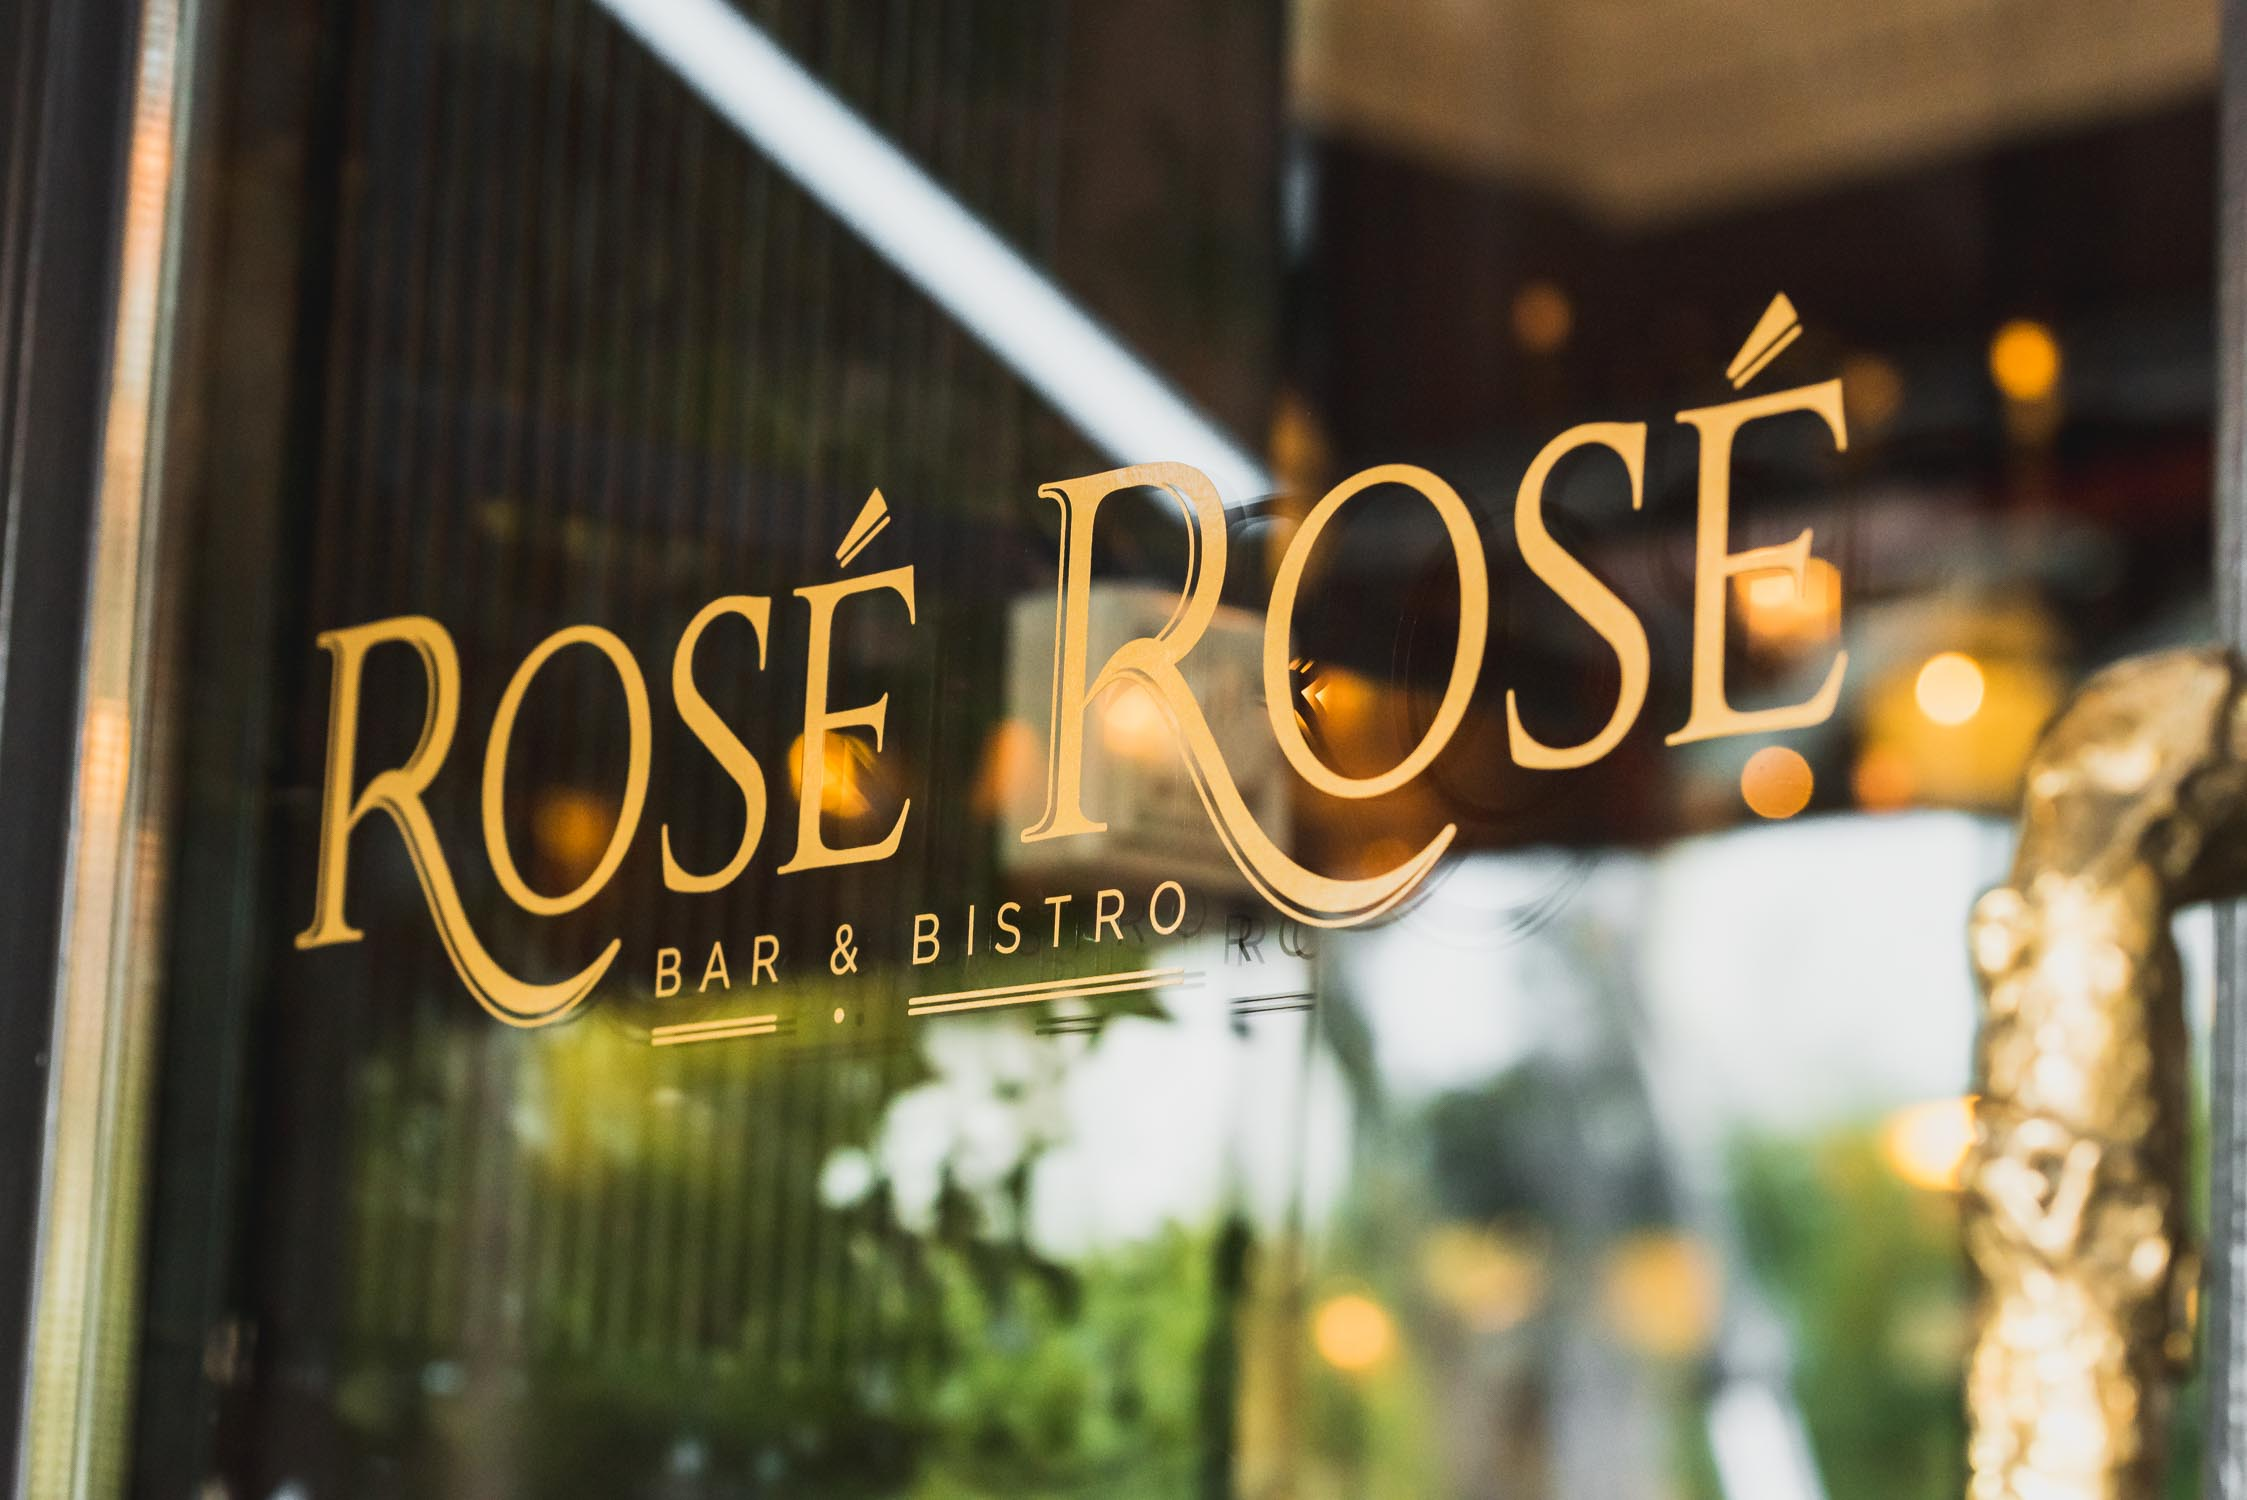 Gavekort hos Rosé Rosé